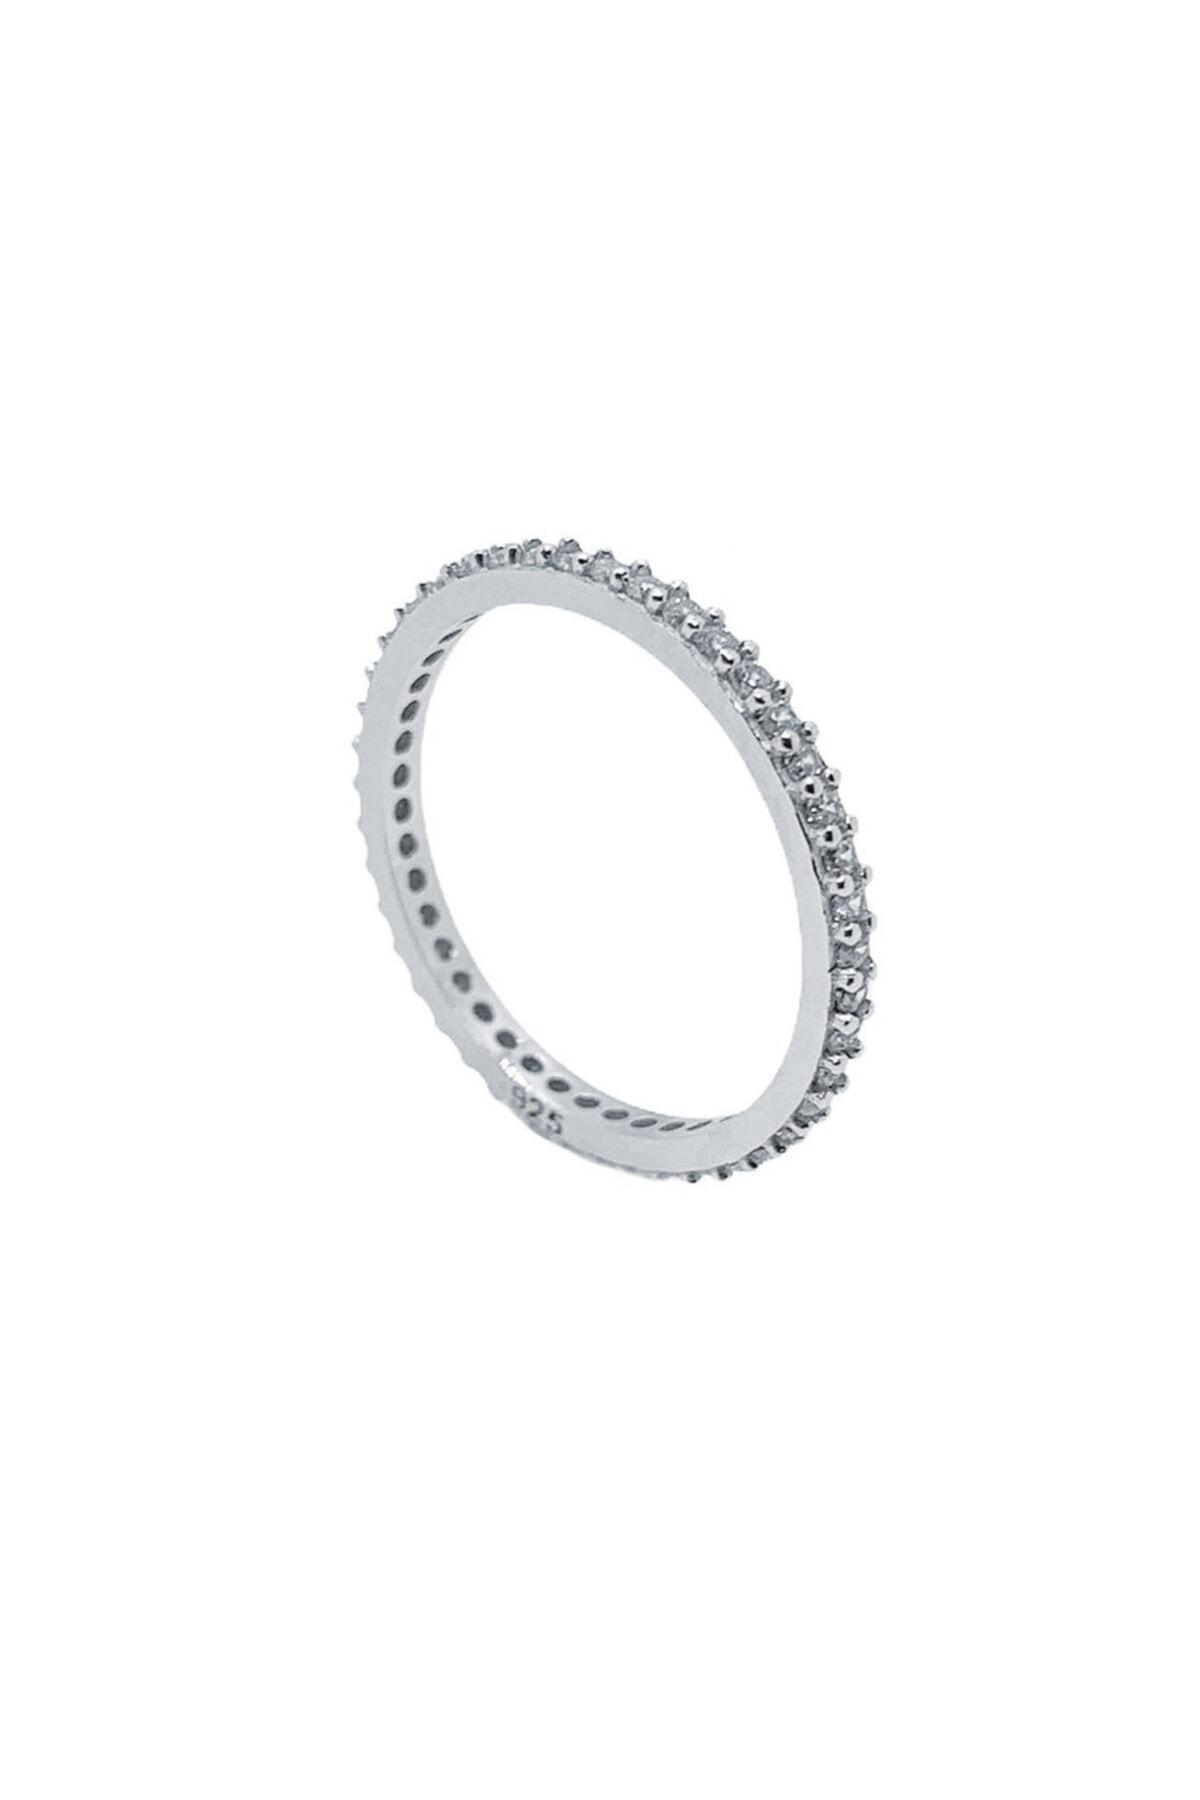 Marylebone Silver Ince Minimal Tamtur Gümüş Yüzük 2